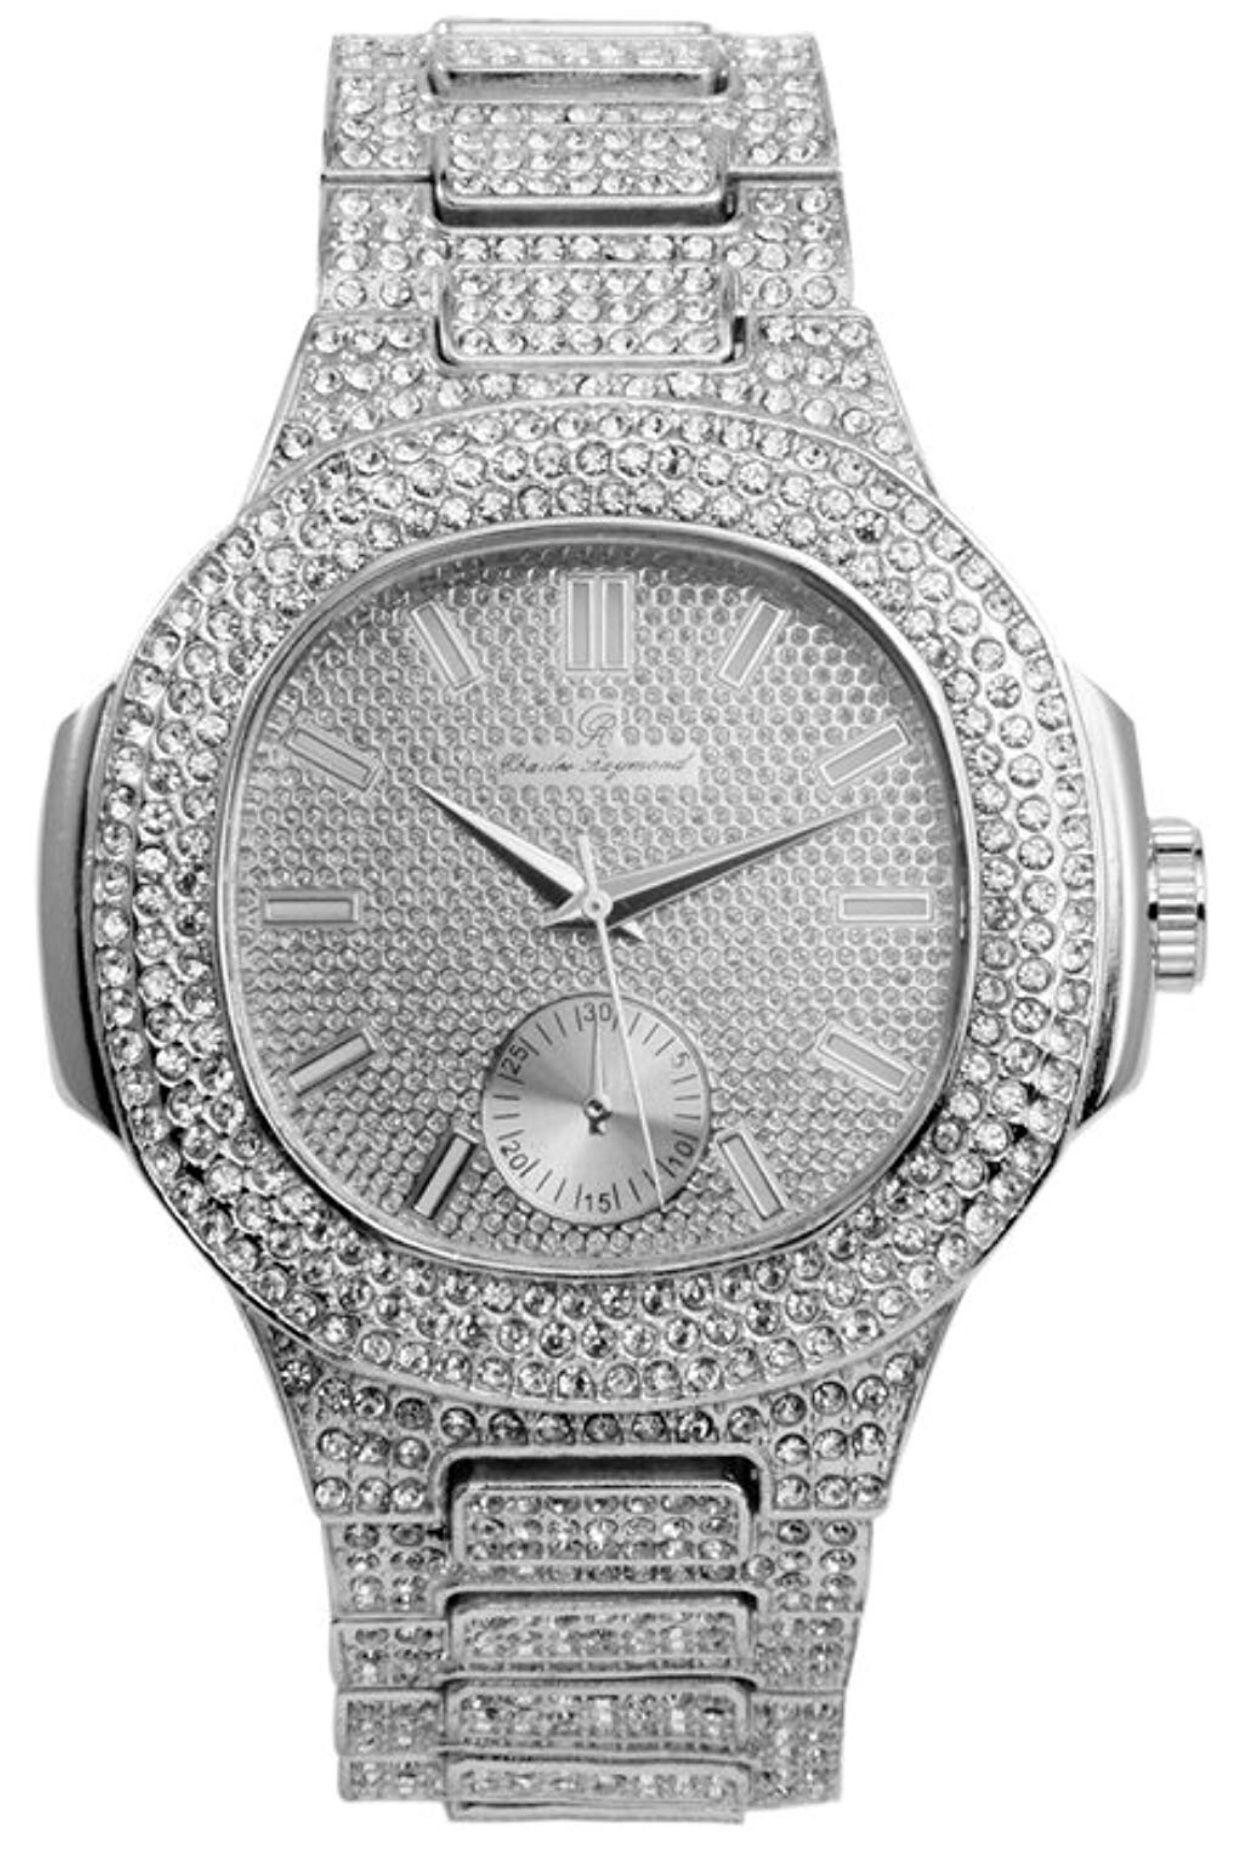 Bling-ed Out Oblong Case Metal Mens Watch w/Matching Bracelet Gift Set - 8475B - Silver